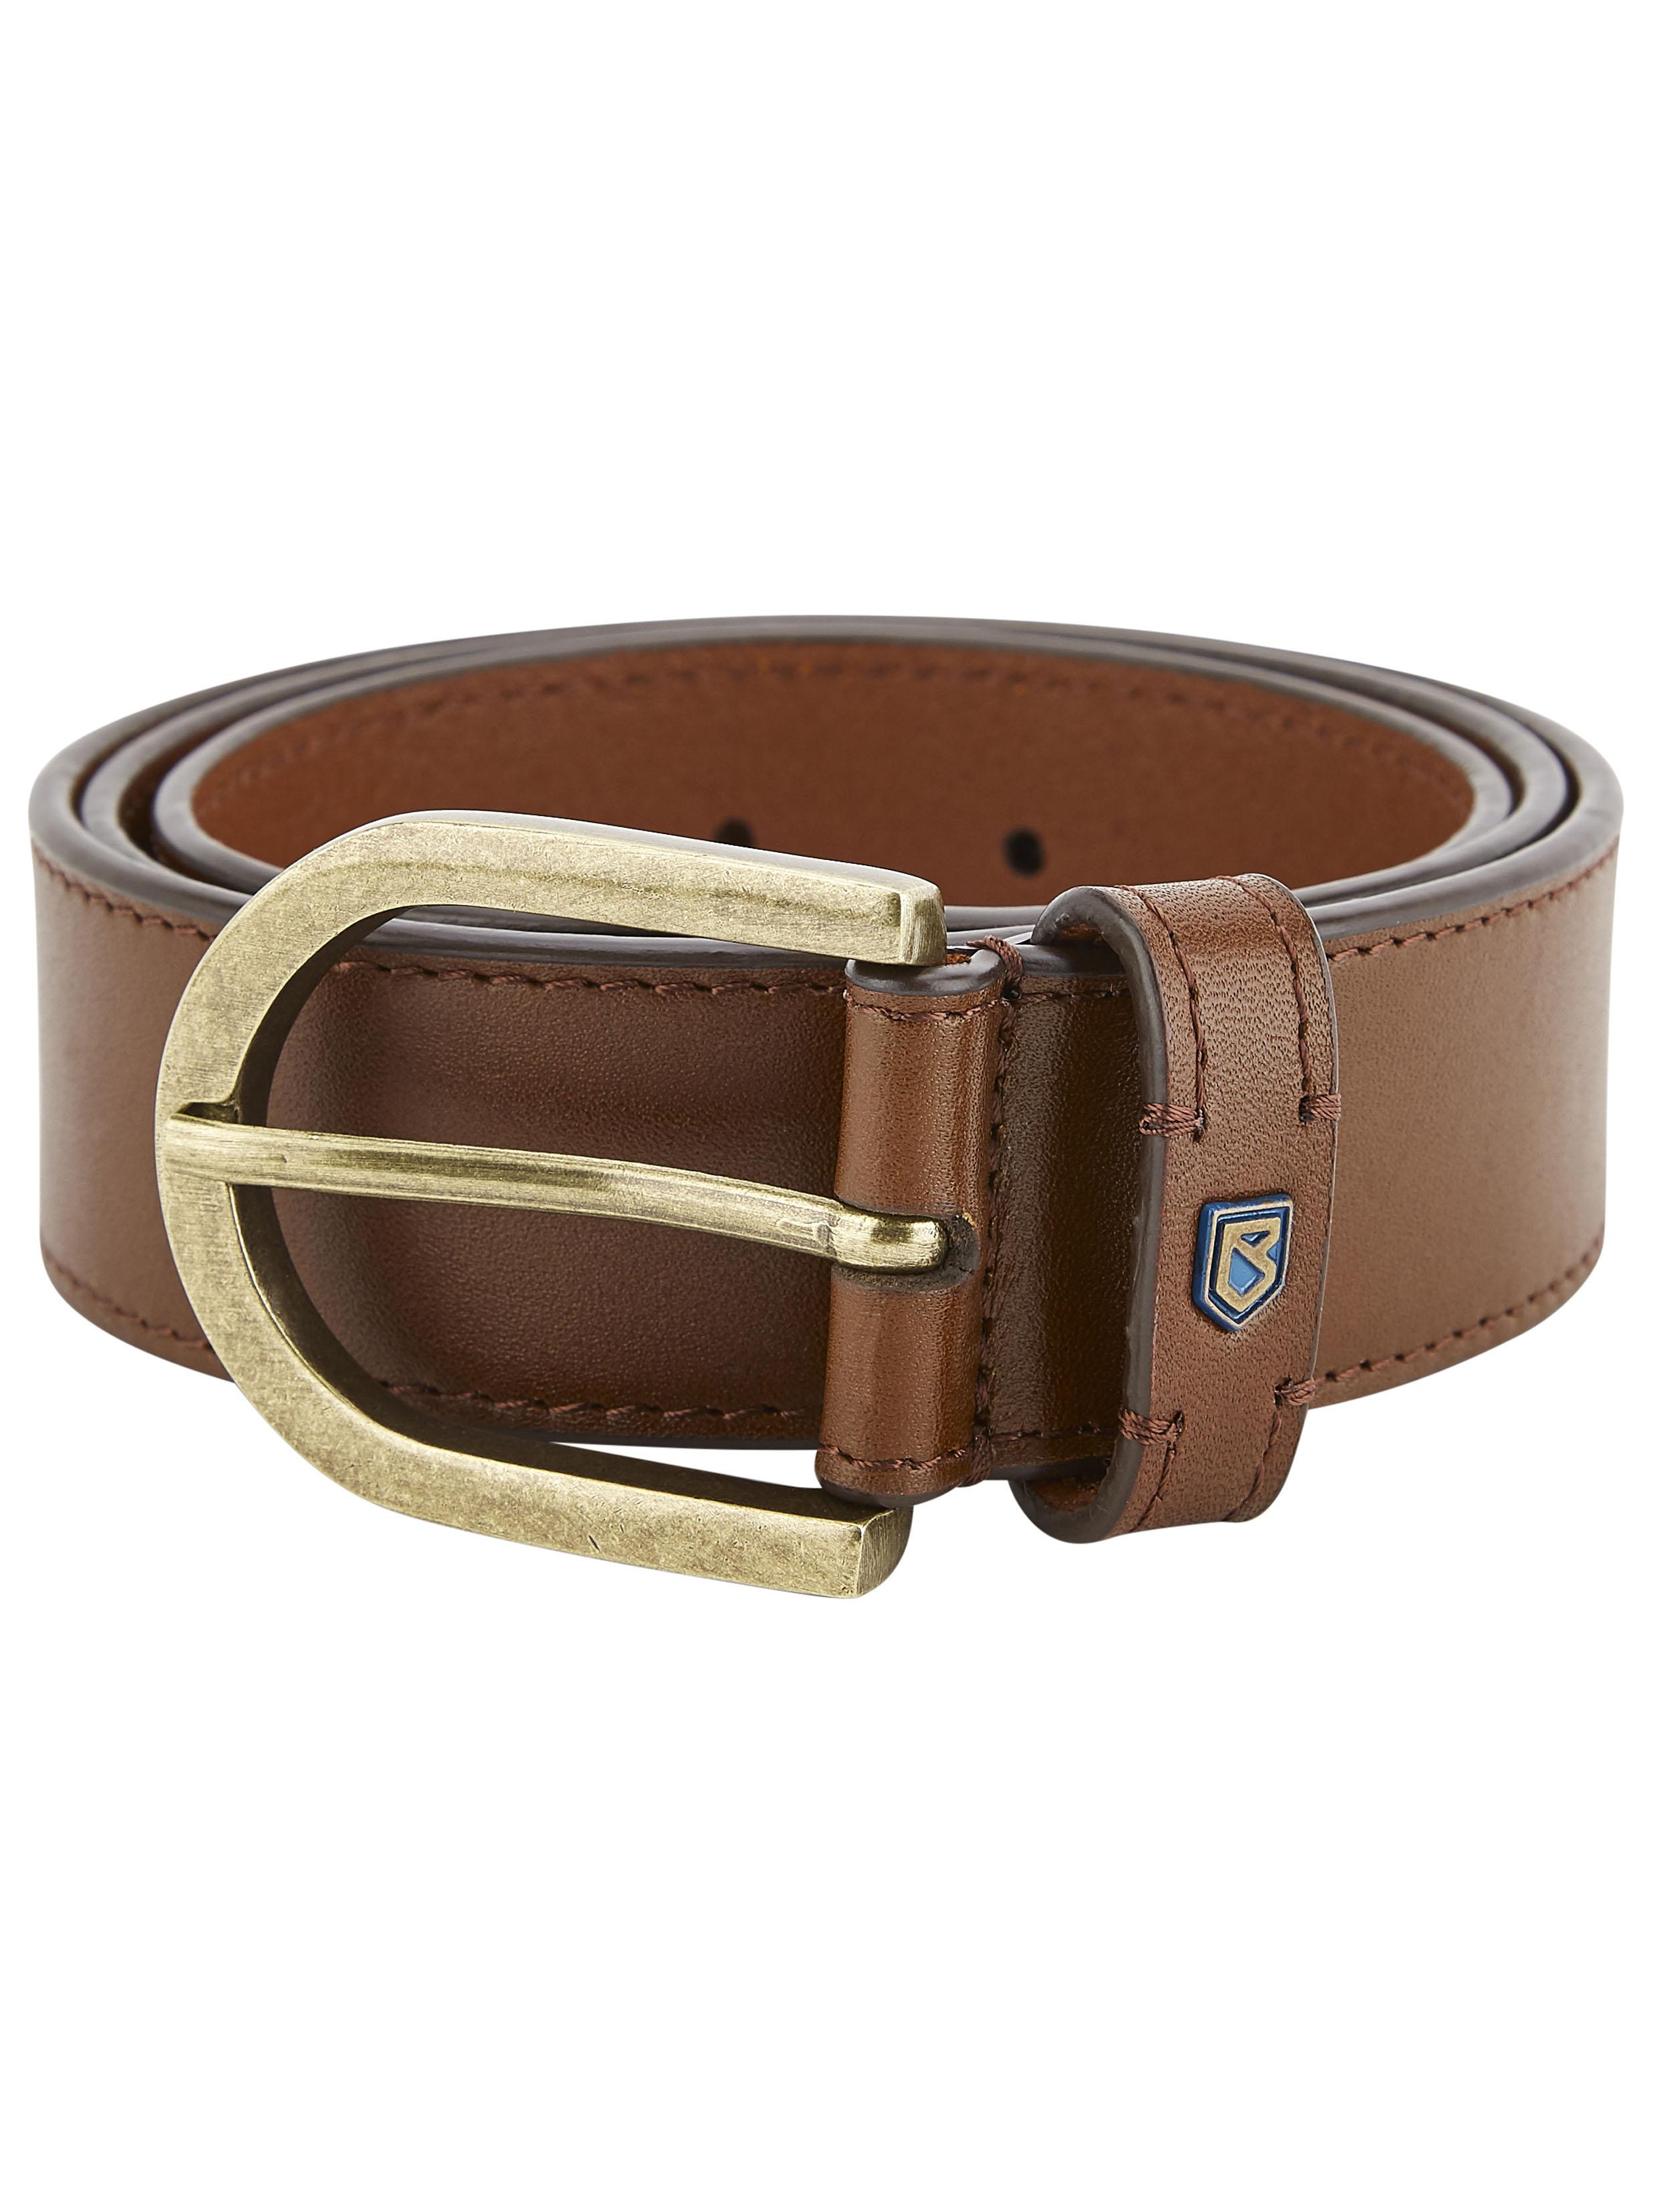 Porthall Leather Belt - Chestnut